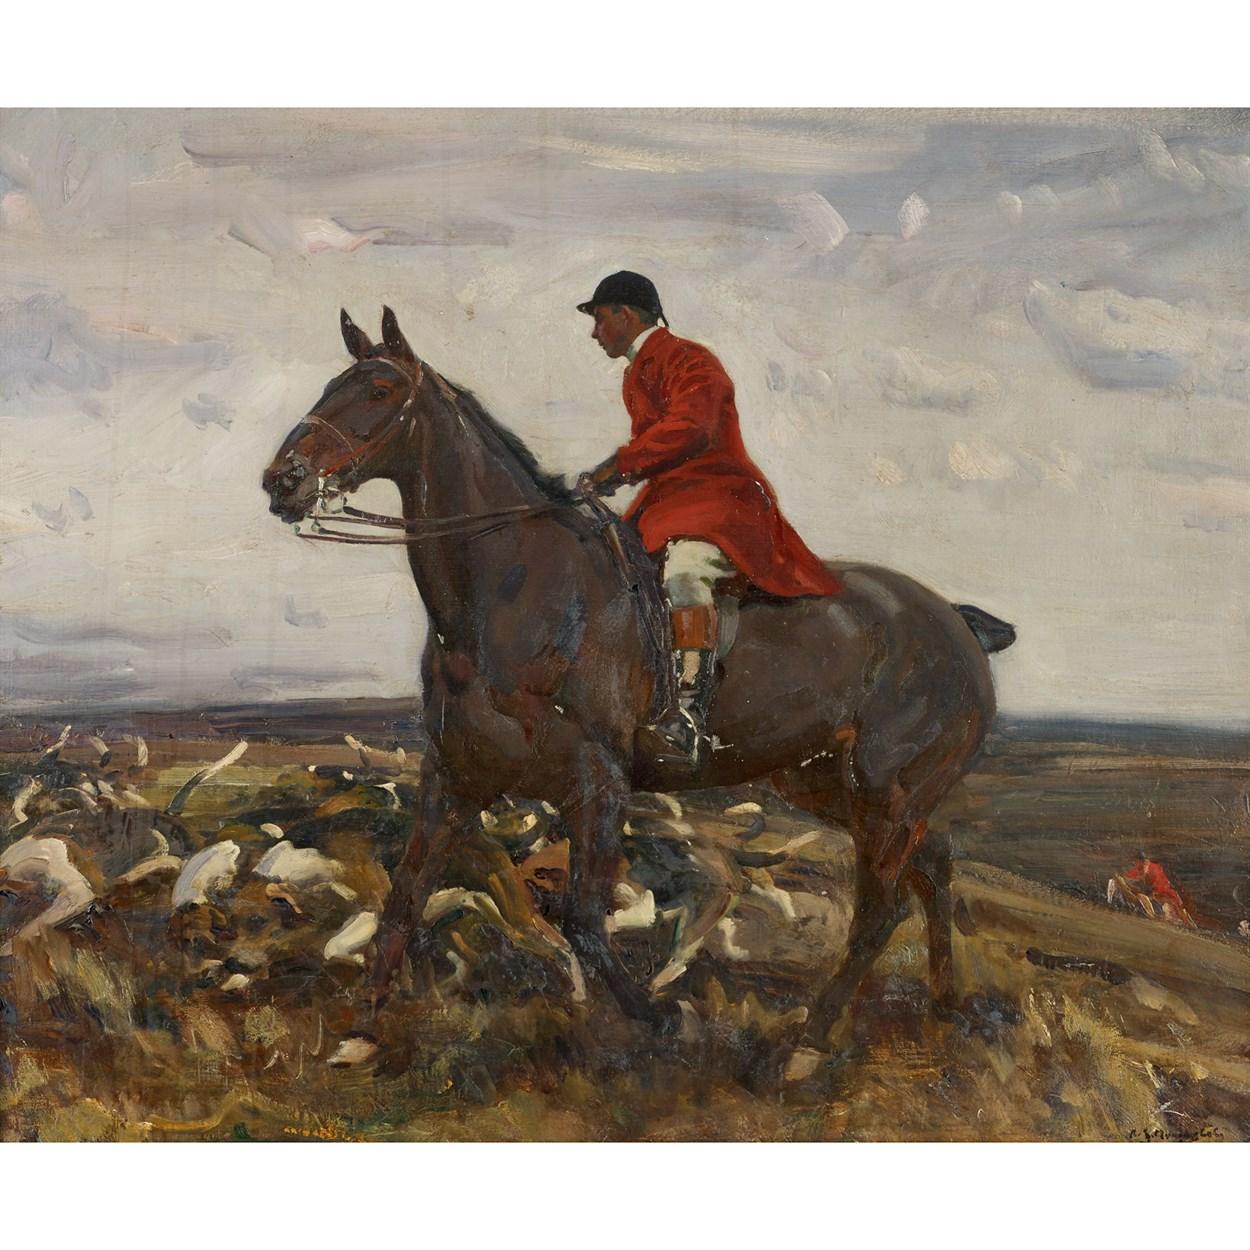 Lot 79 - Sir Alfred Munnings (British, 1878-1959)